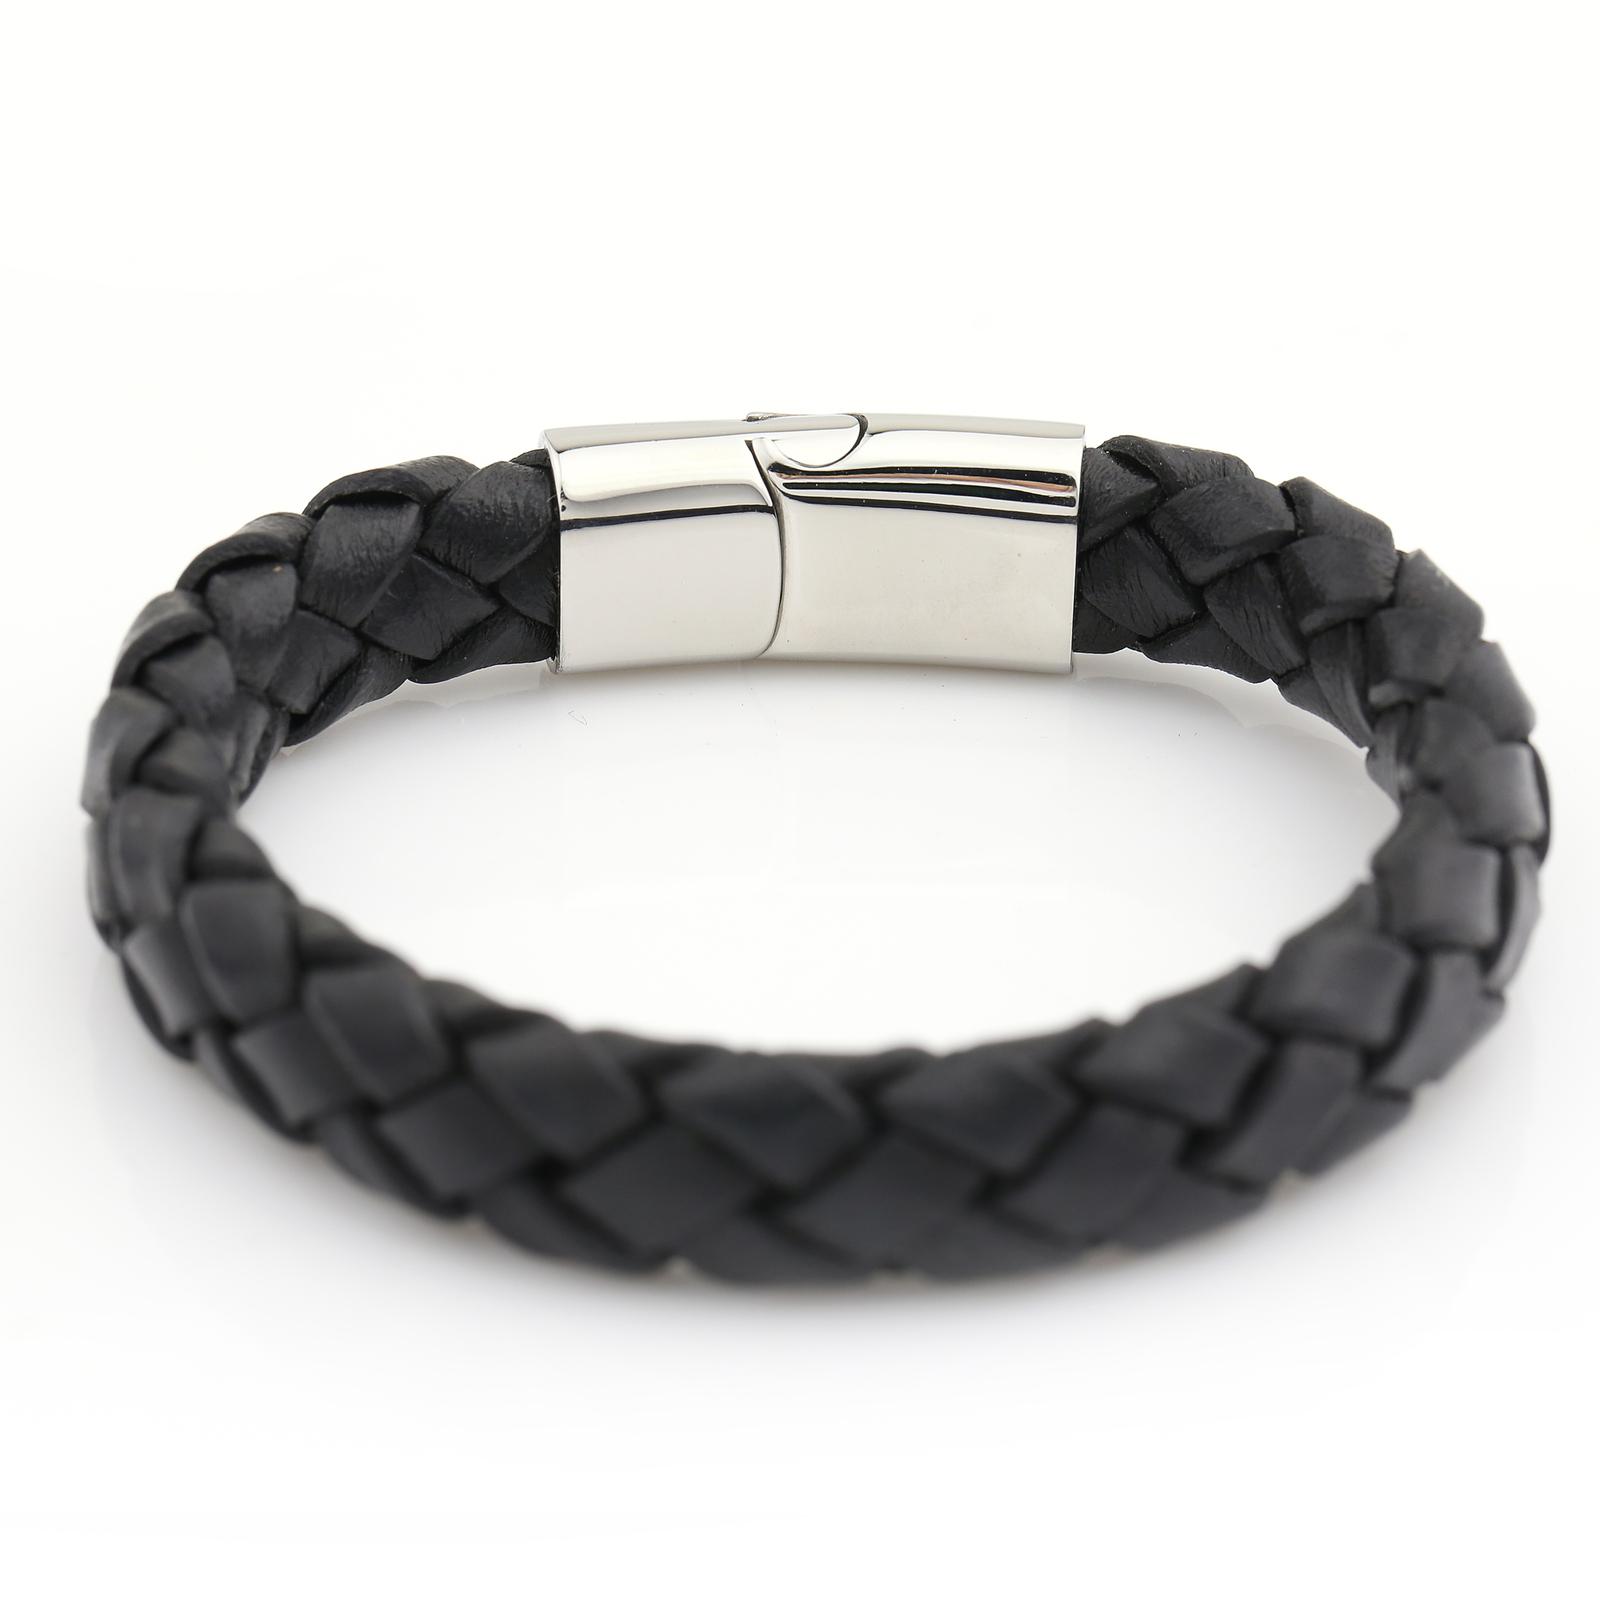 UNITED ELEGANCE Trendy Unisex Stainless Steel Braided Leather Bracelet